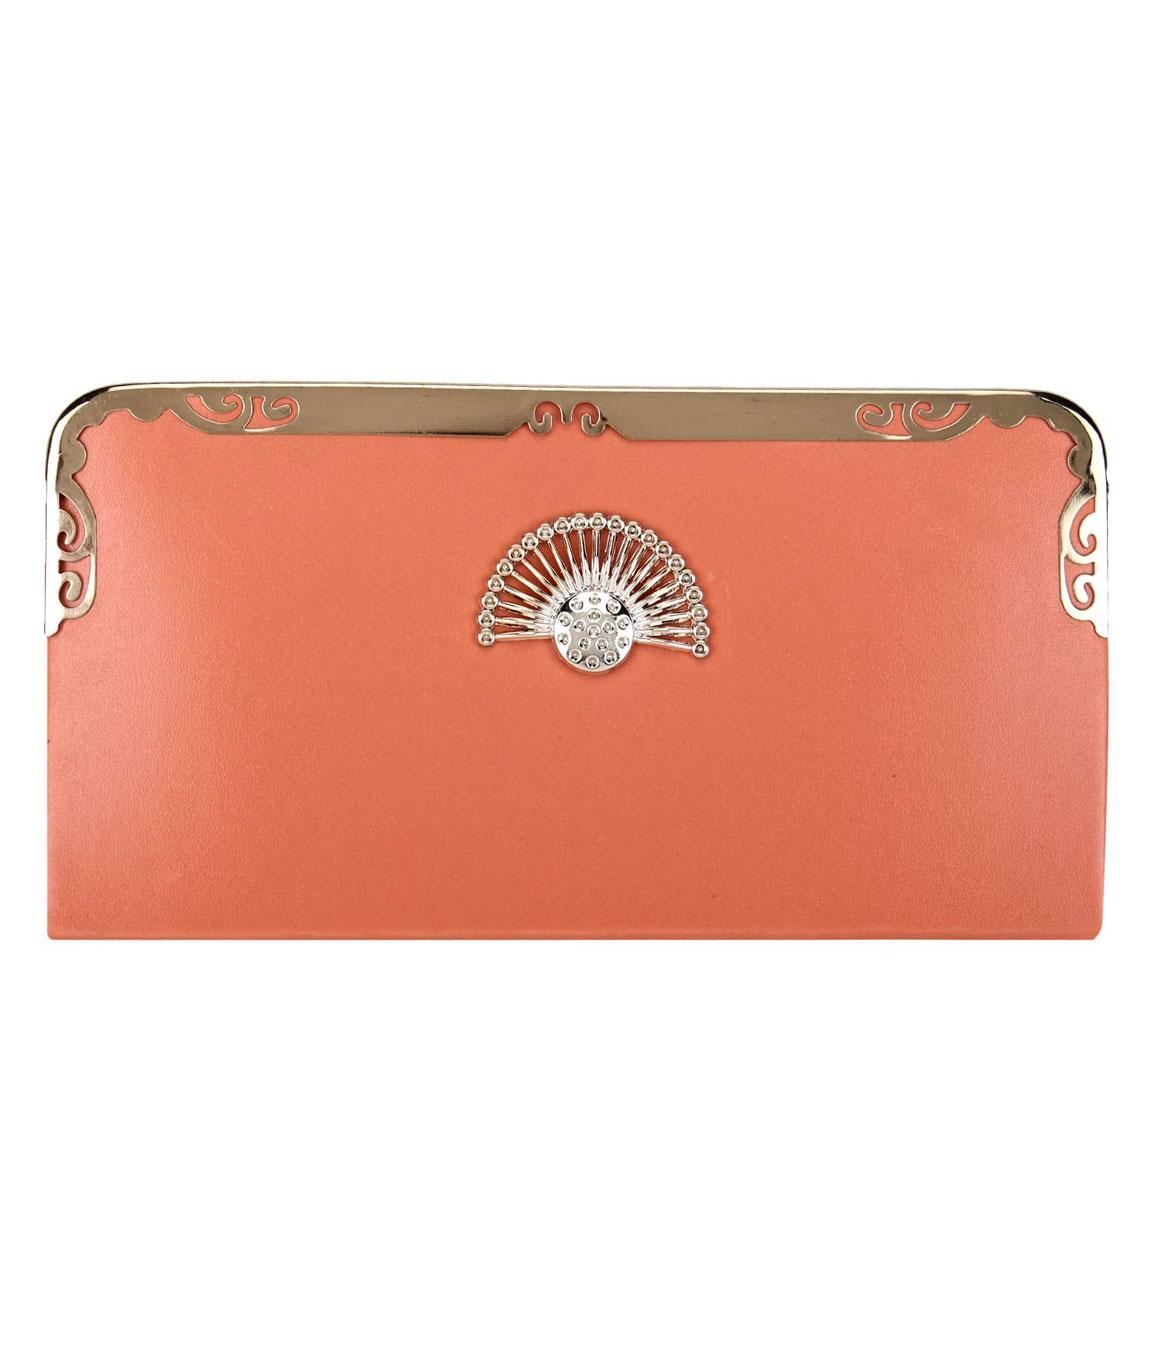 Talat Fashion PU Leather Stylish Wallet/clutch/purse(peach)